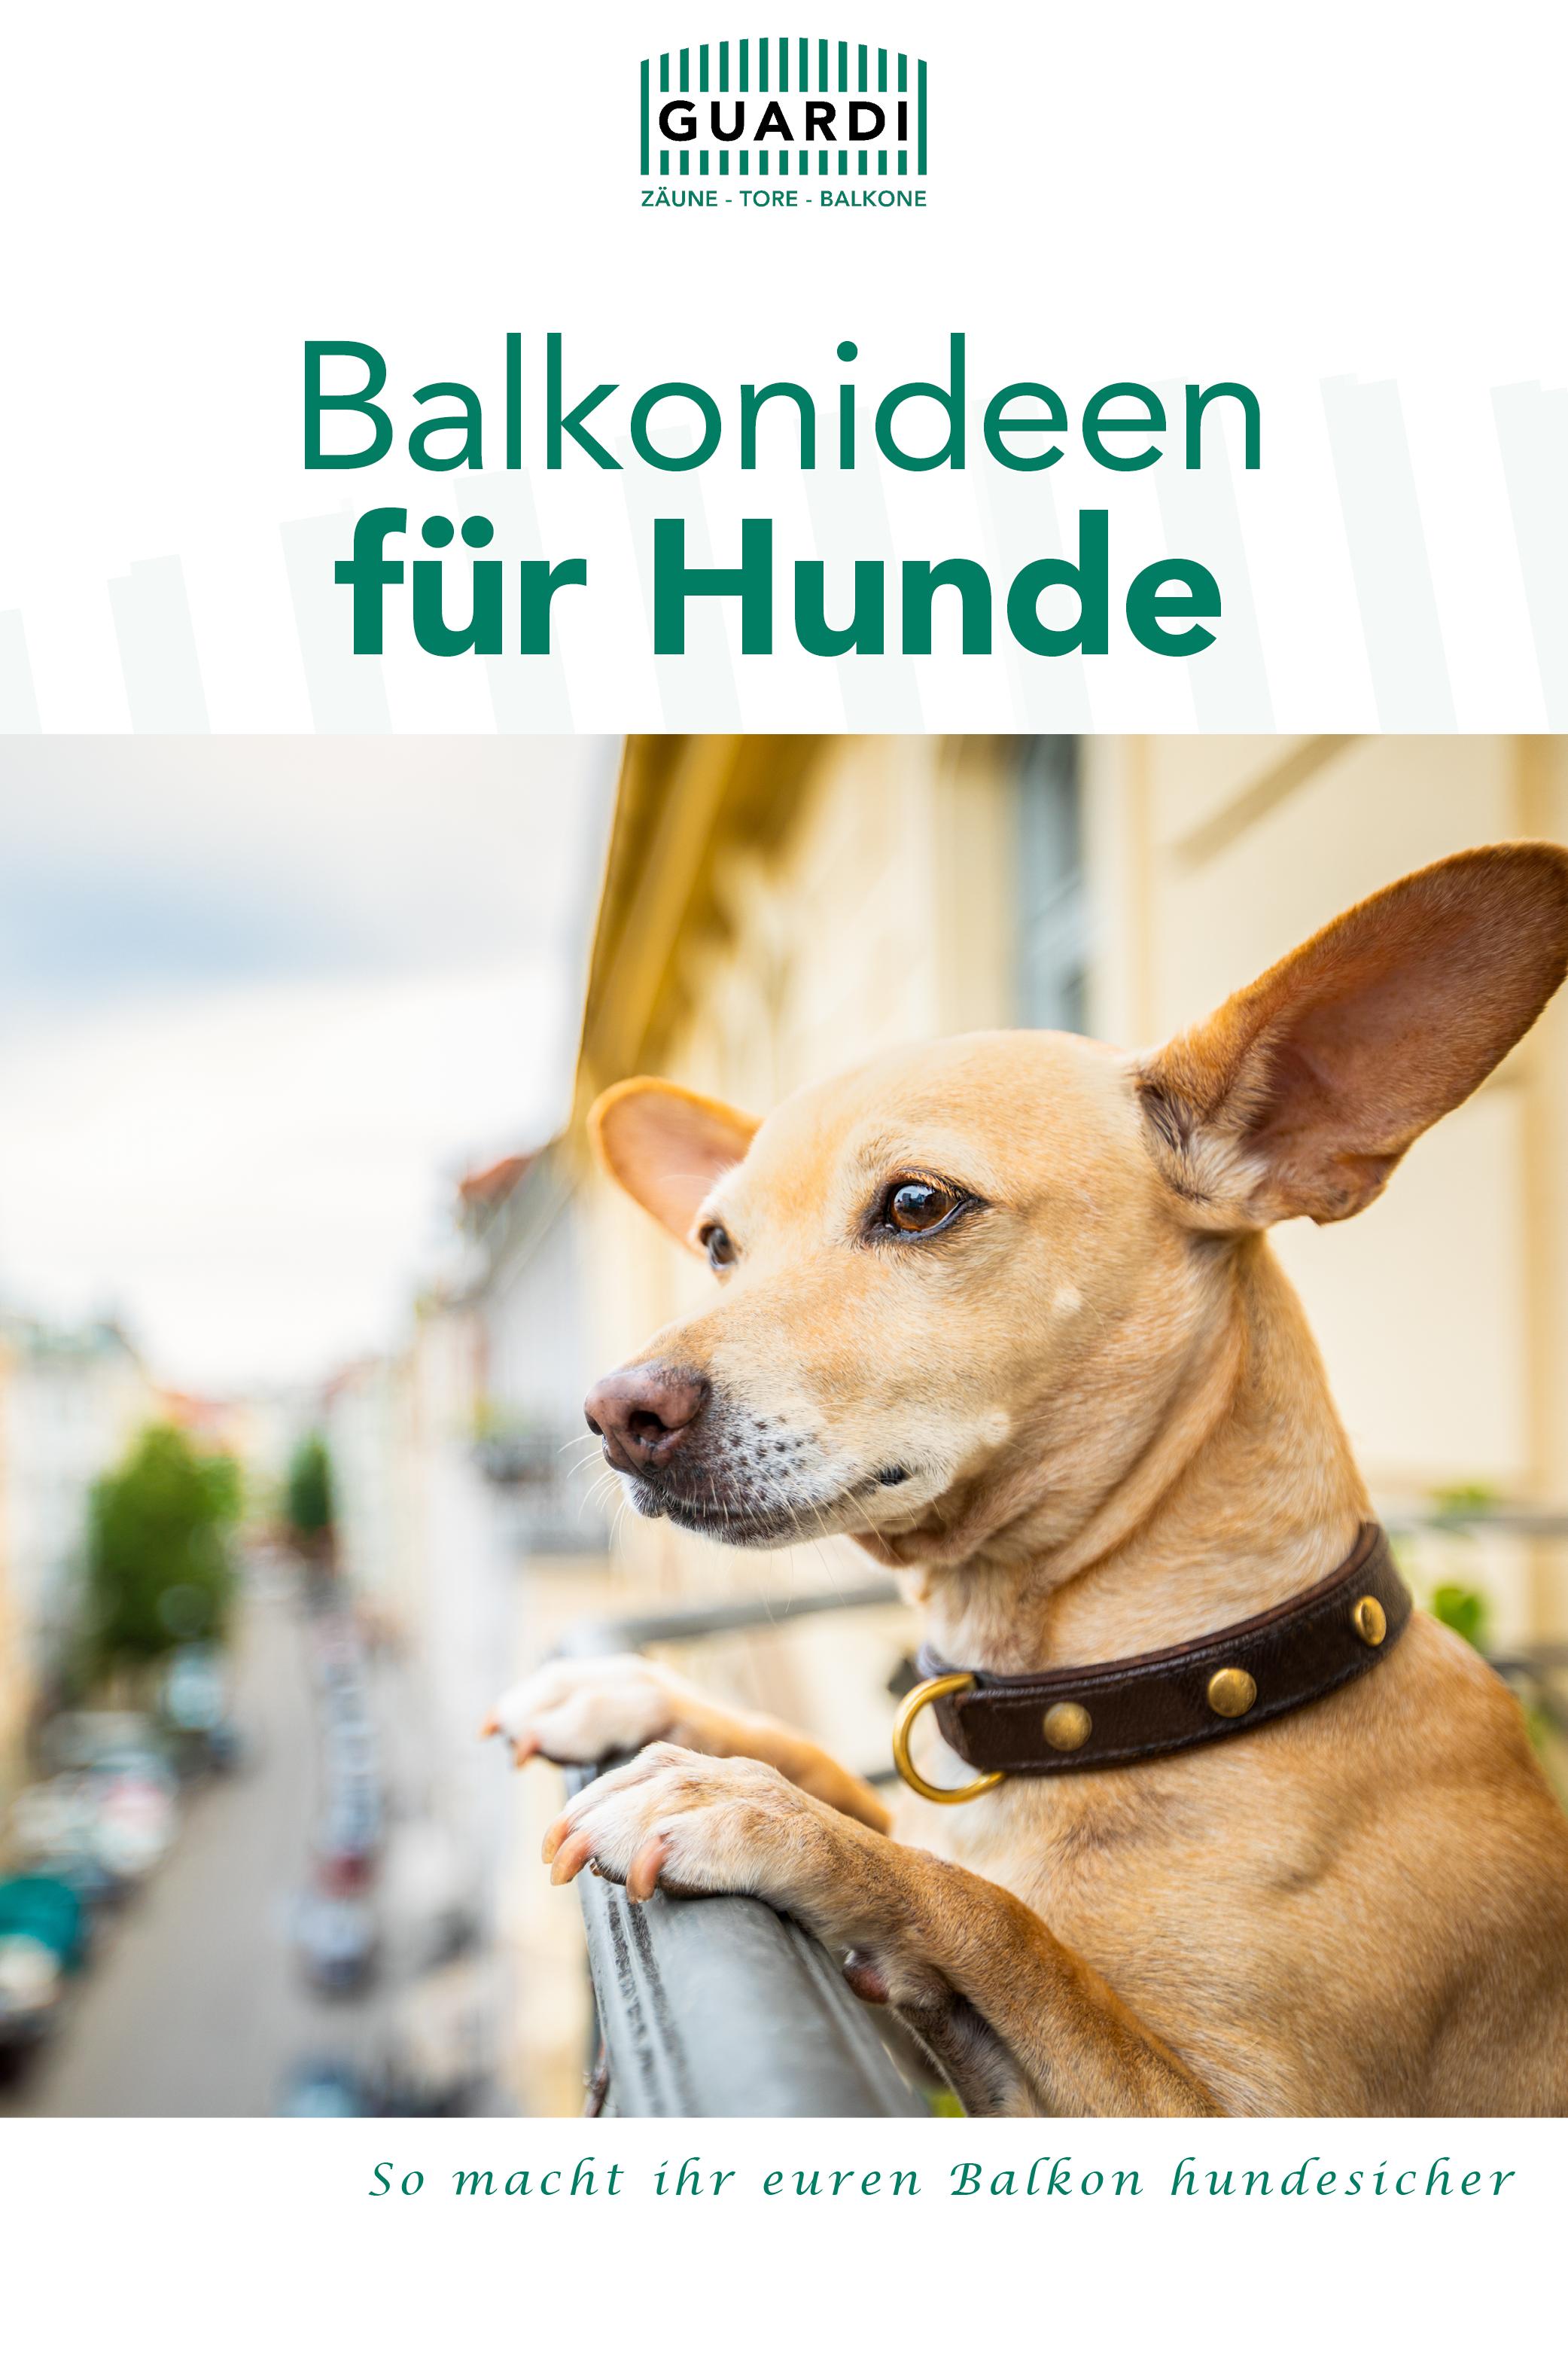 Balkonideen Fur Hunde So Macht Ihr Euren Balkon Hundesicher Guardi Balkon Ideen Balkon Hunde